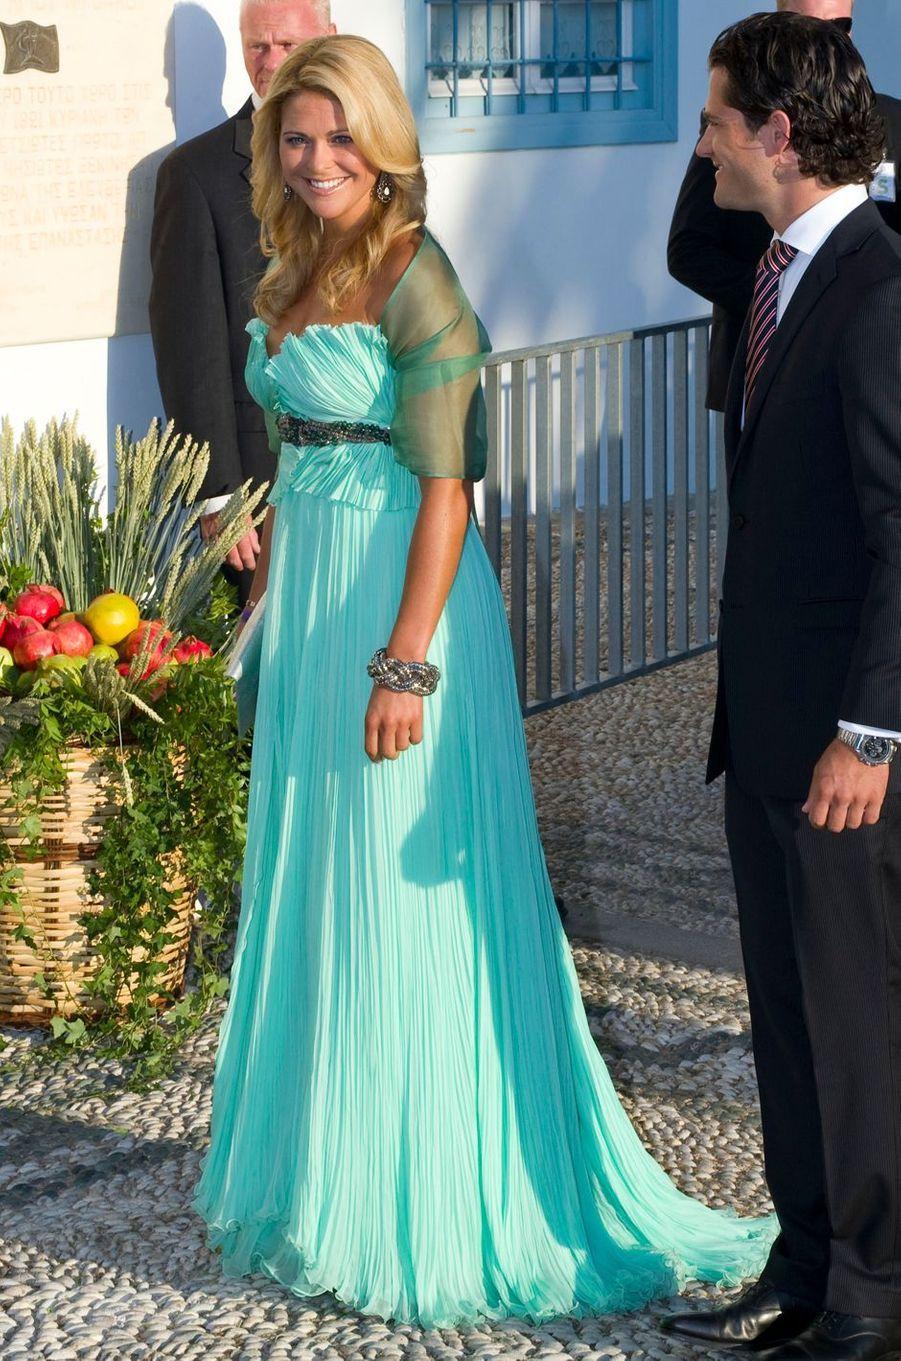 La princesse Madeleine de Suède dans une robe Roberto Cavalli le 28 août 2010